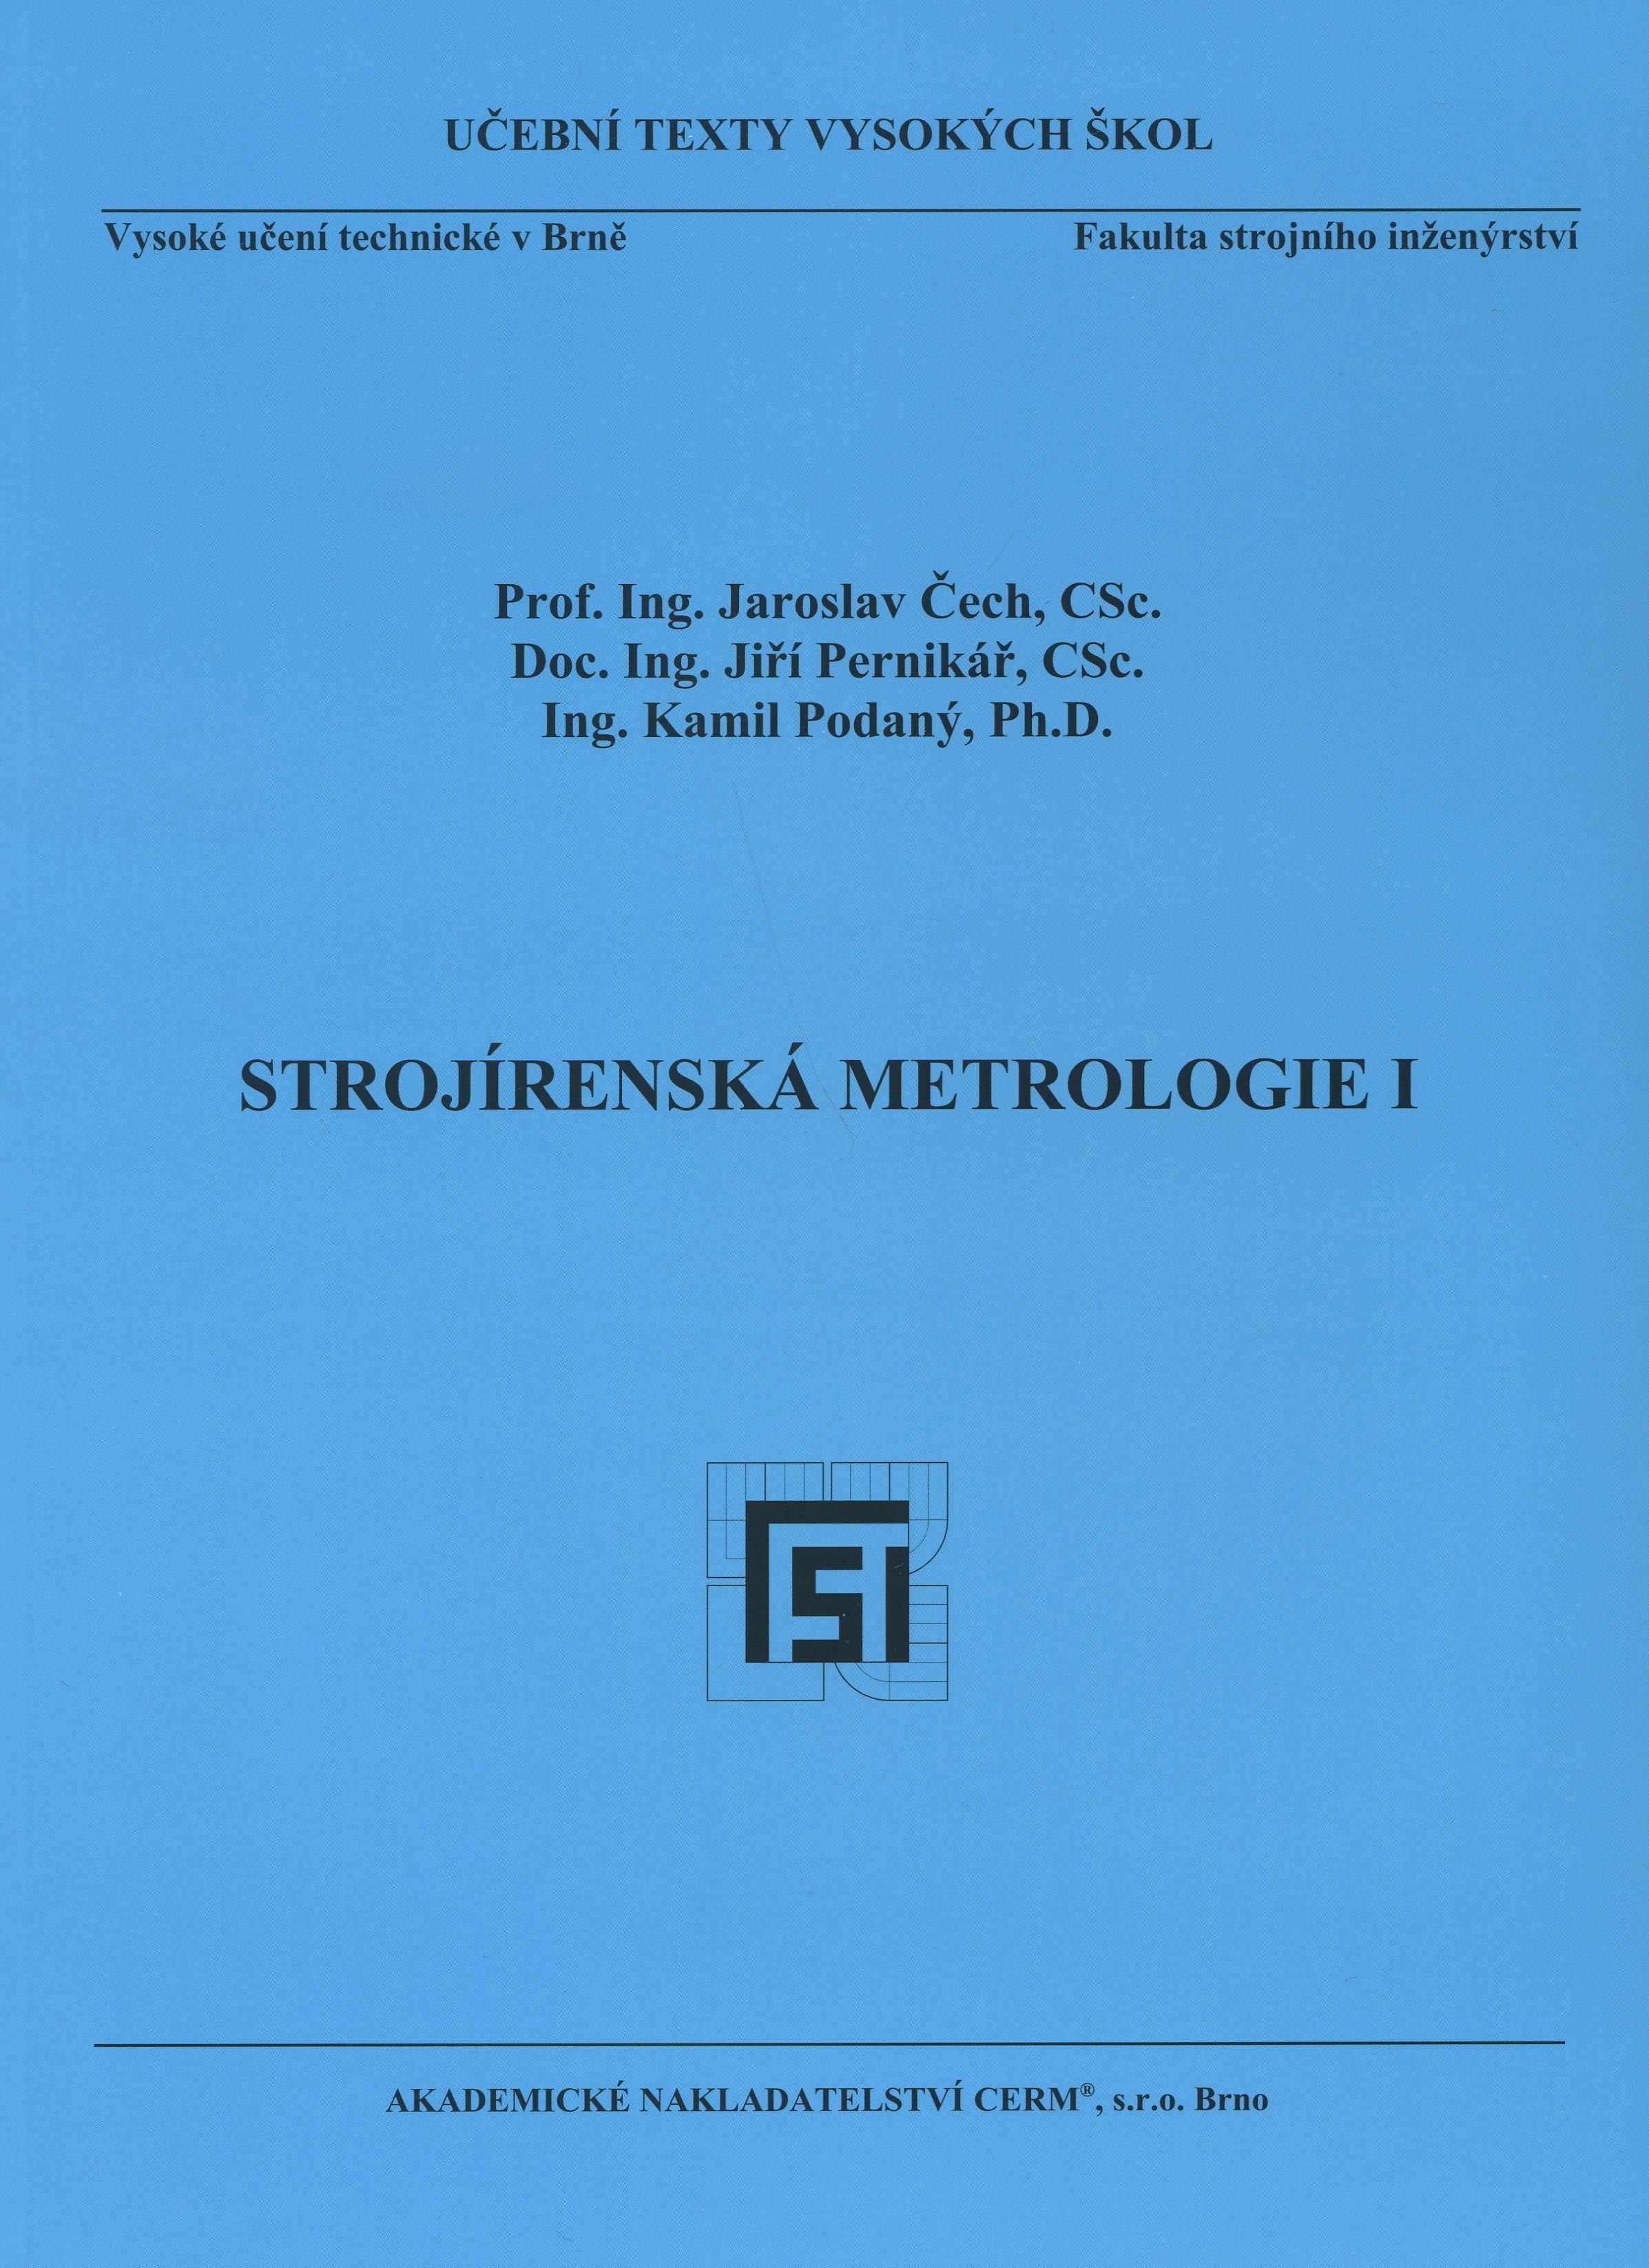 Strojírenská metrologie I.